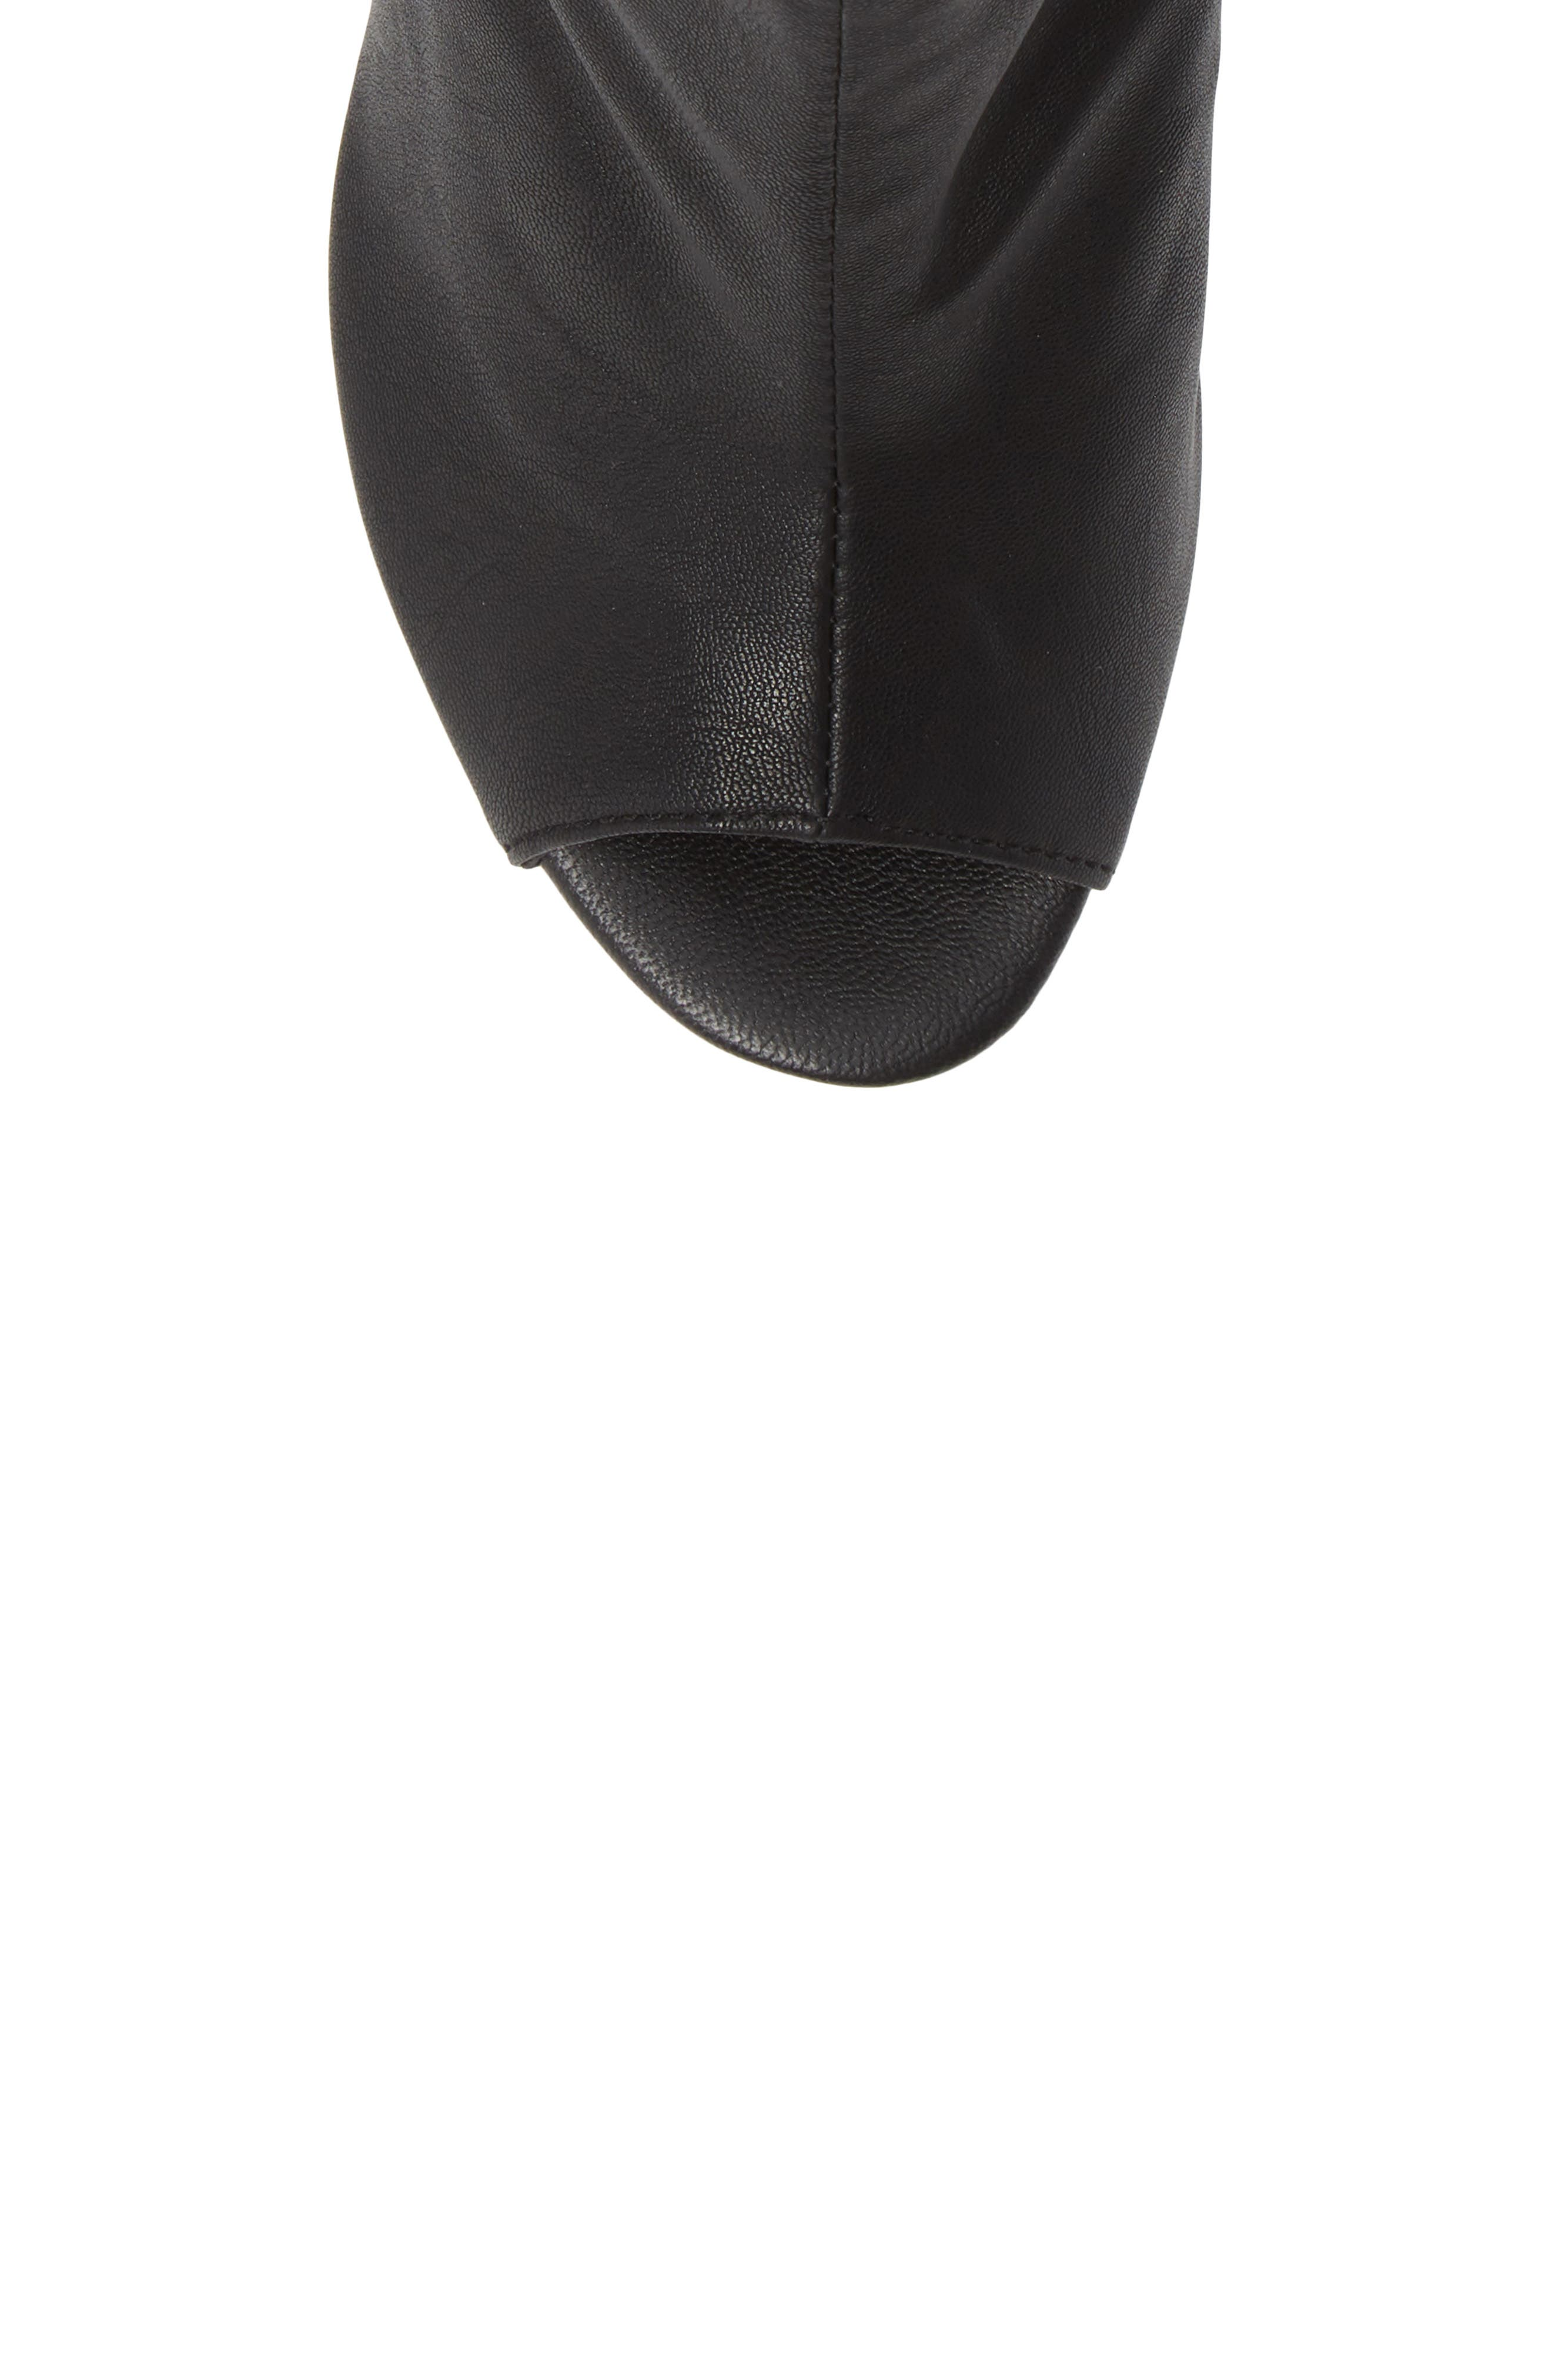 CORDANI, Tyra Peep Toe Platform Bootie, Alternate thumbnail 5, color, BLACK FABRIC